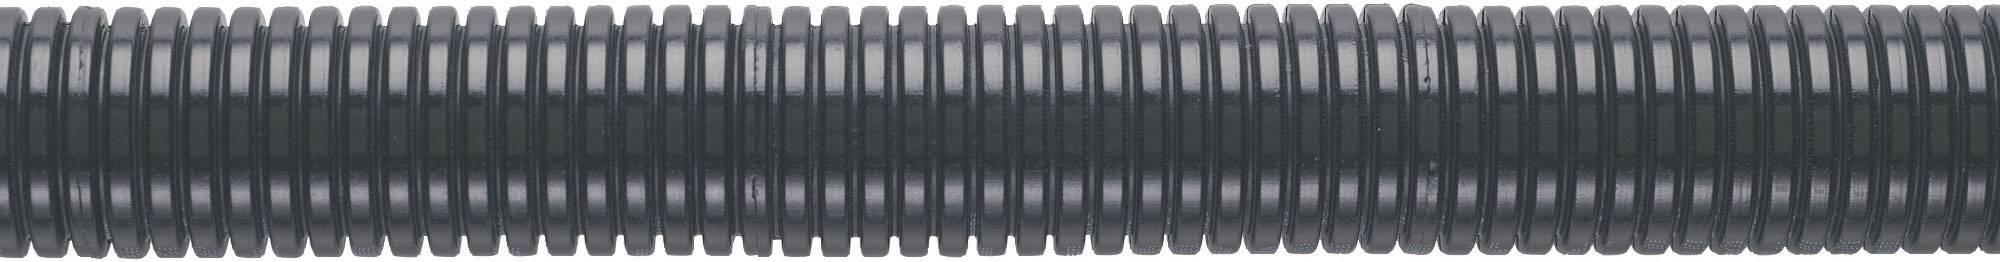 Ochranný plášť (2,5 m) LappKabel SILVYN FPAS 10/6,3x10 BK (61754005), PA 6